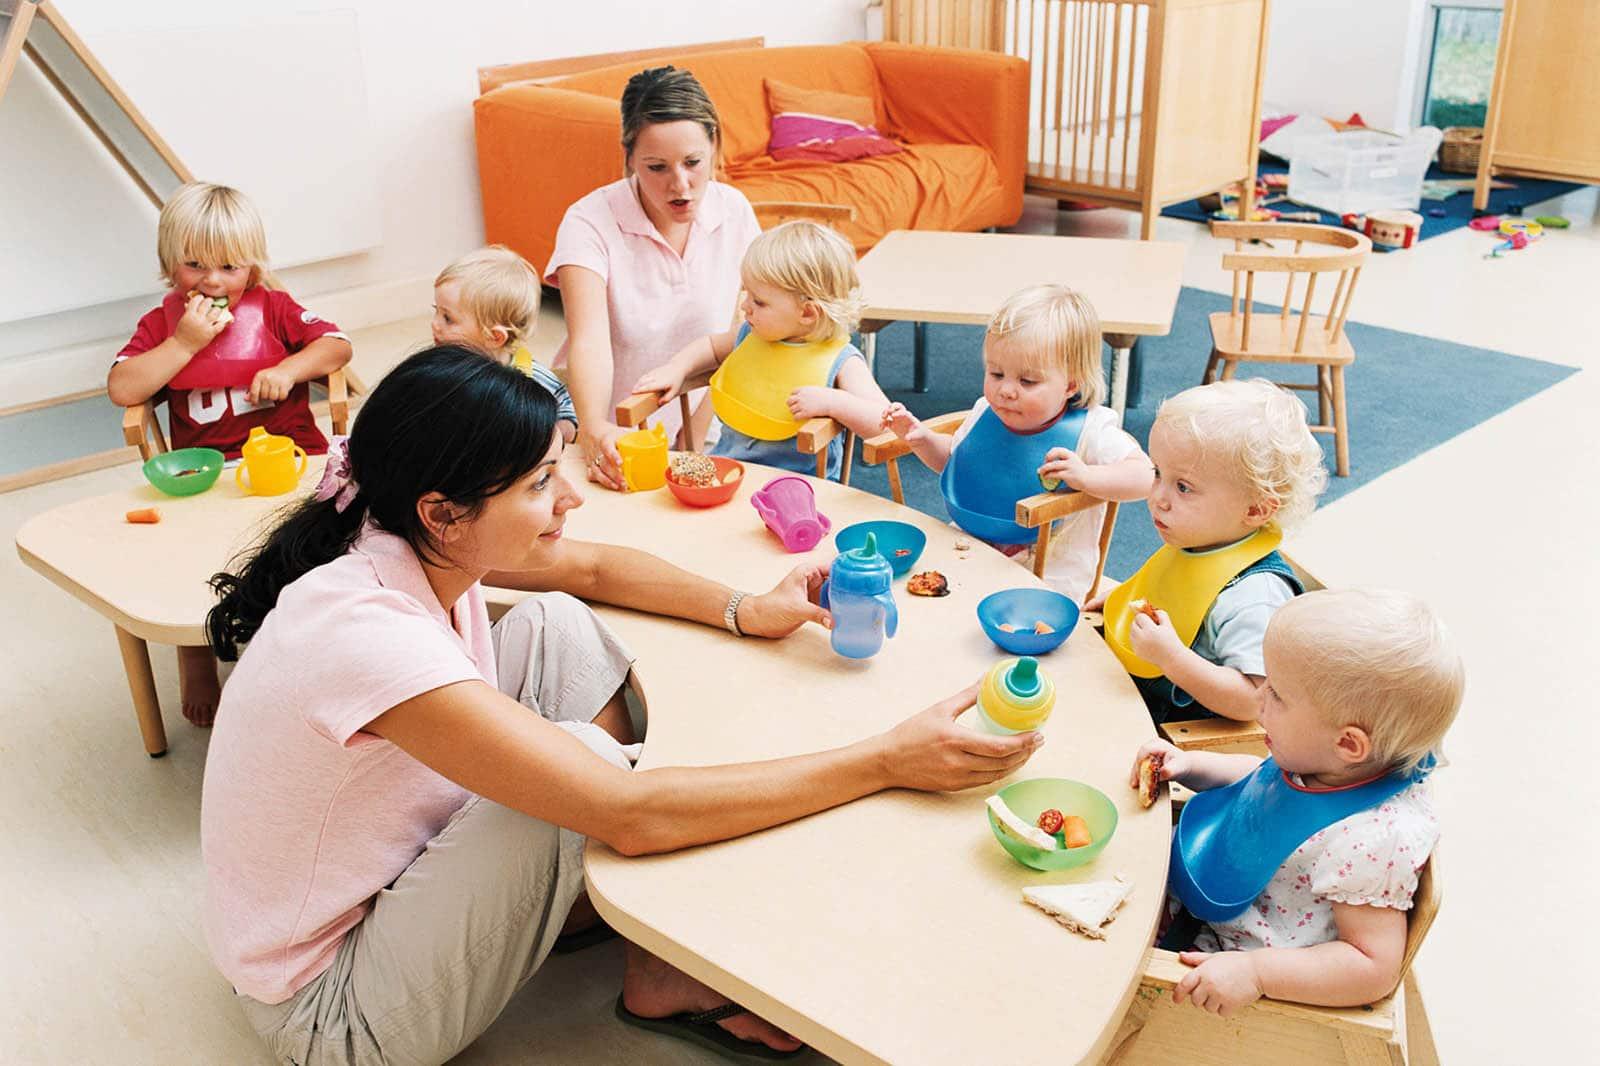 kinderhotels-vacanze-con-neonati-Baby2